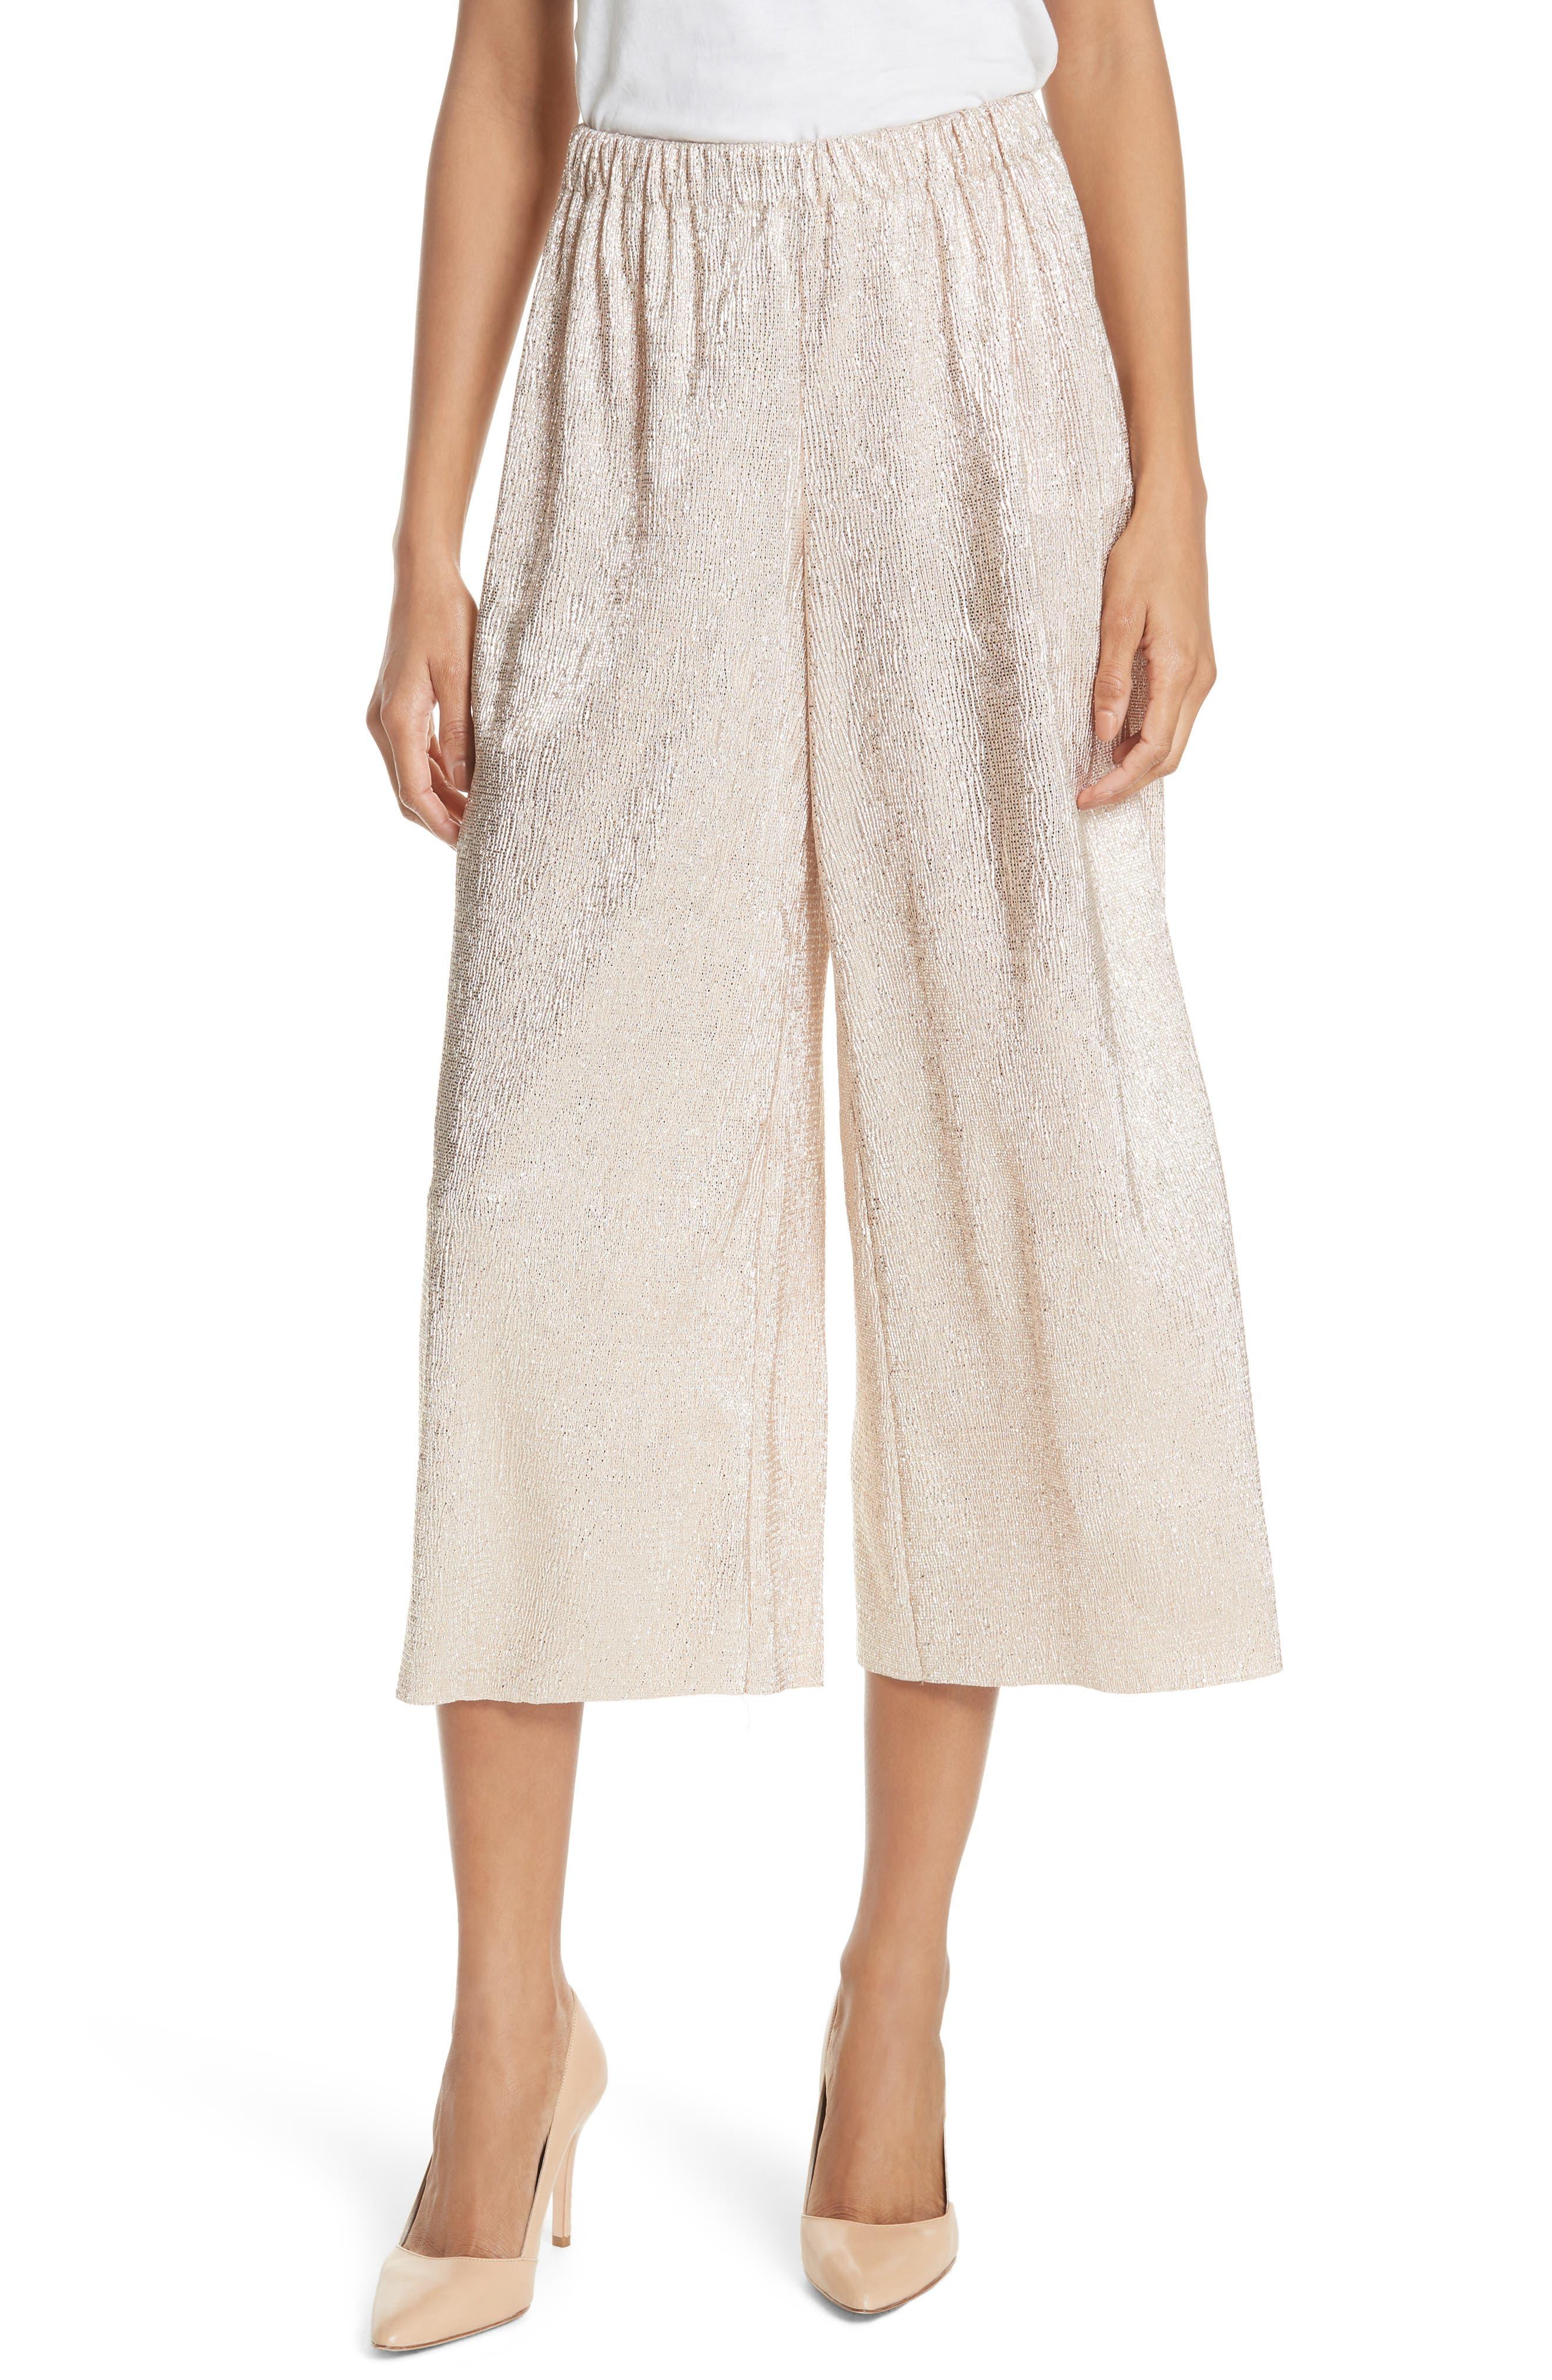 Elba Textured Crepe Wide Leg Pants,                             Main thumbnail 1, color,                             Blush